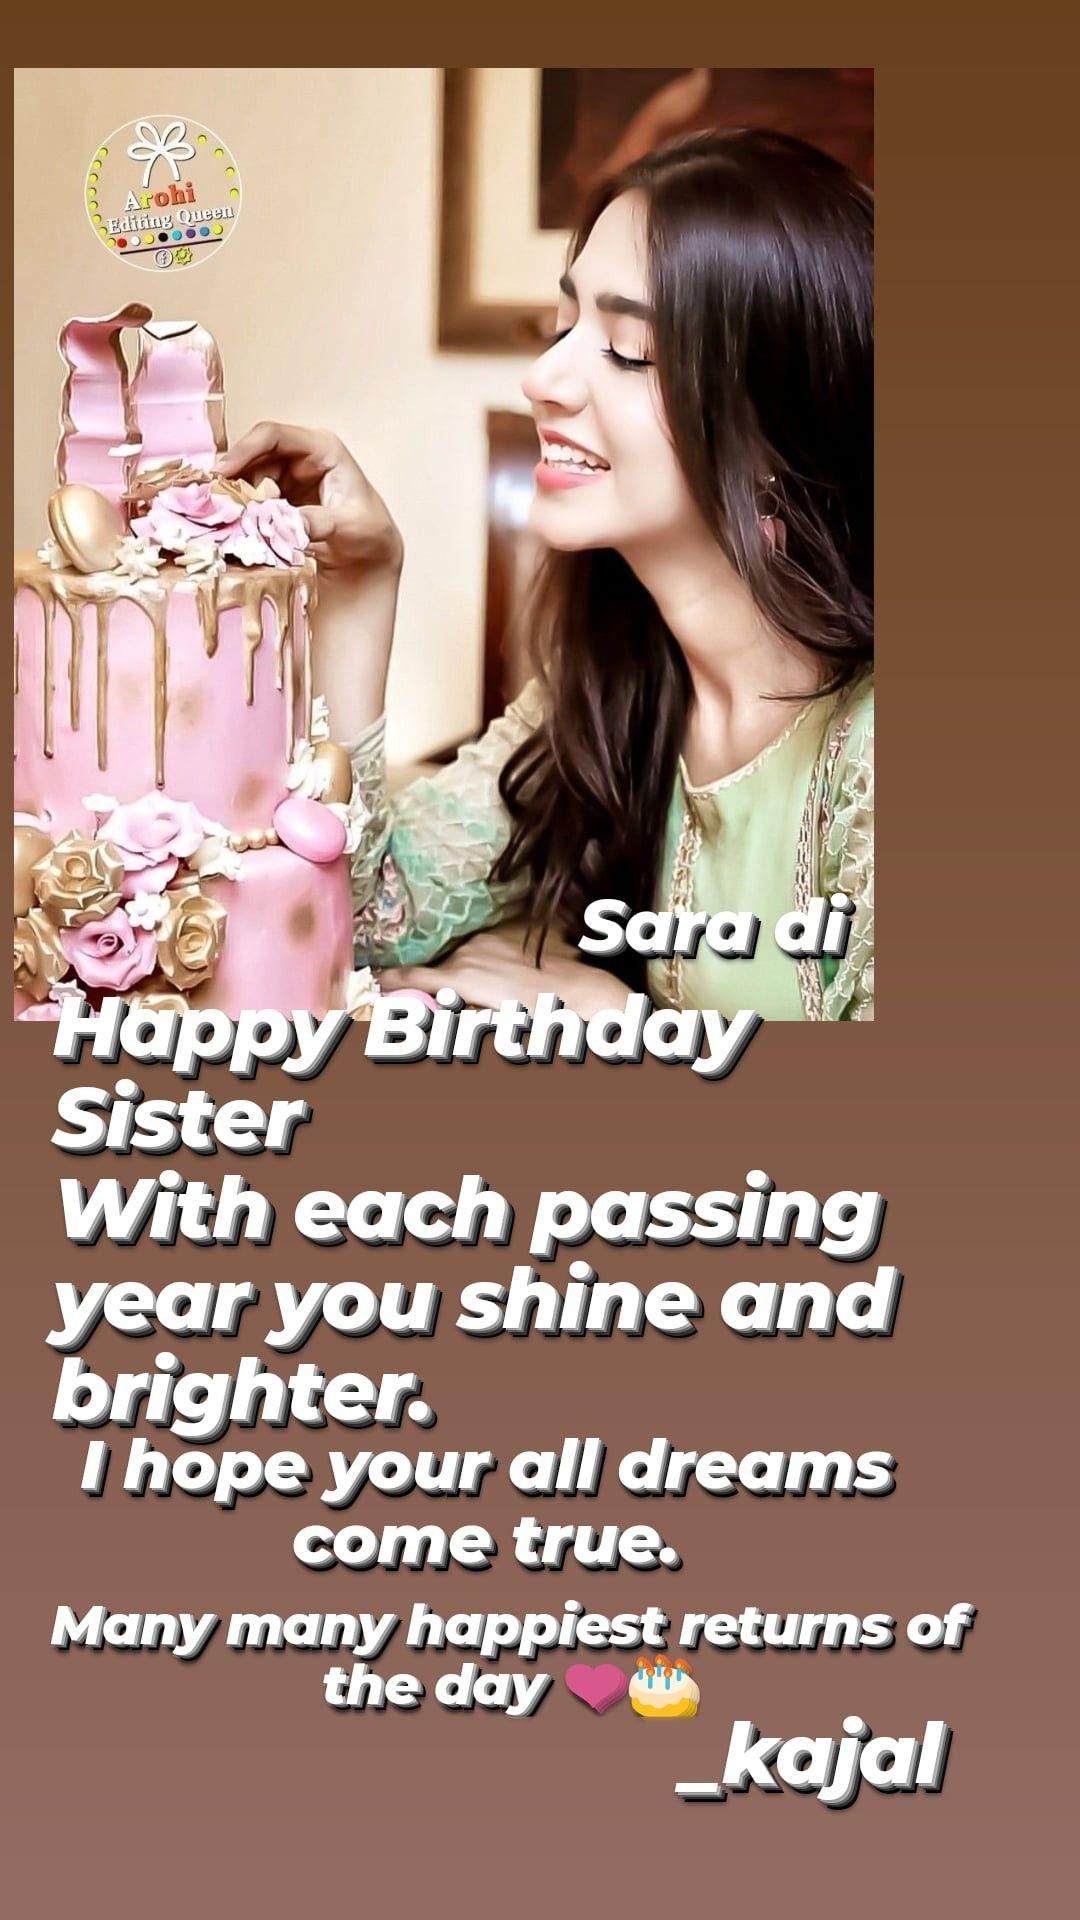 Many Many Many Happy Returns Of The Day Happy Birthday To U Sis Happy Birthday Sister Happy Birthday Happy Returns